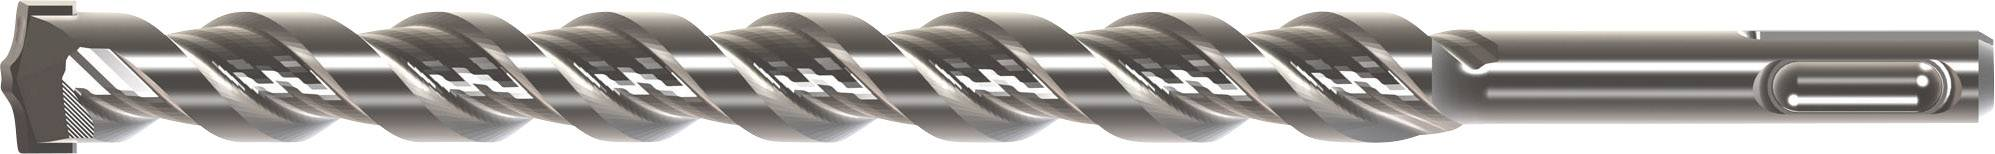 Tvrdý kov kladivový vrták Heller 186872, 10 mm, 310 mm, 1 ks